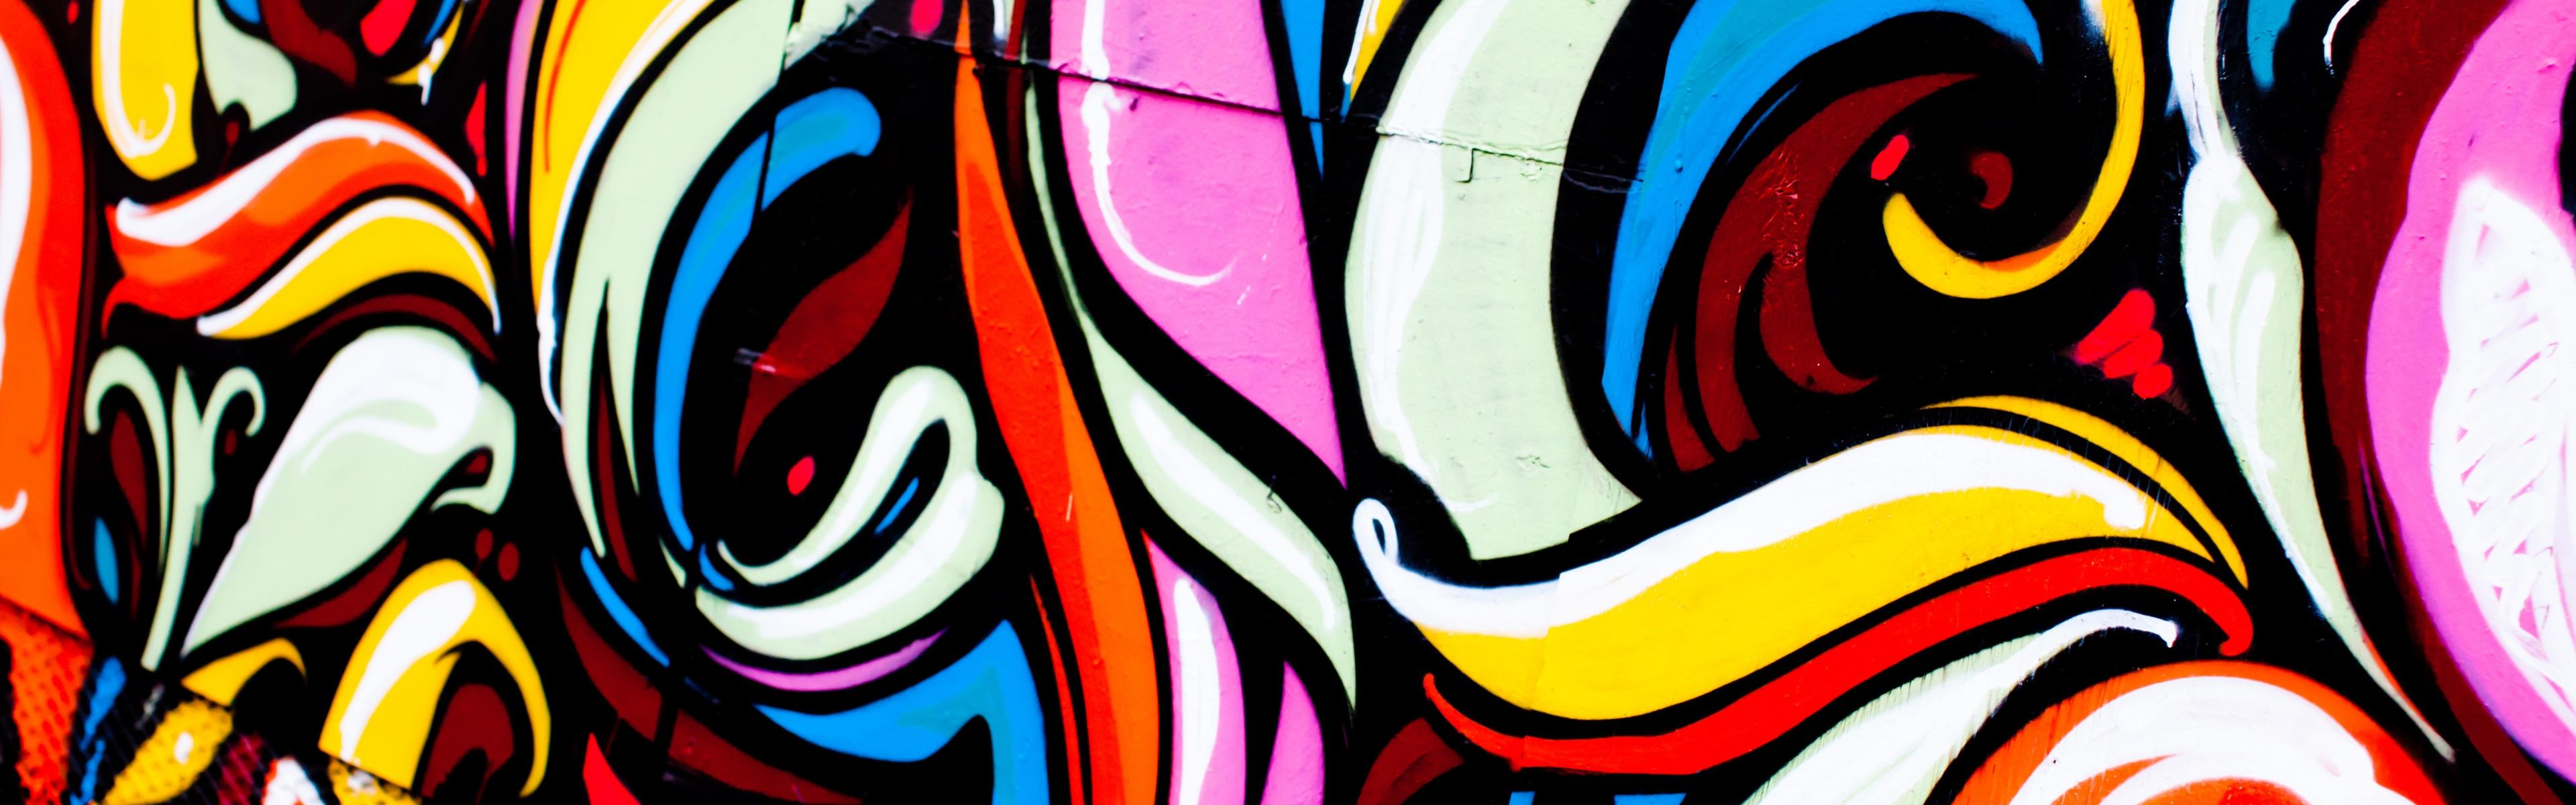 Graffiti Wallpaper Picture Art HD Wallpapers 262 Backgrounds